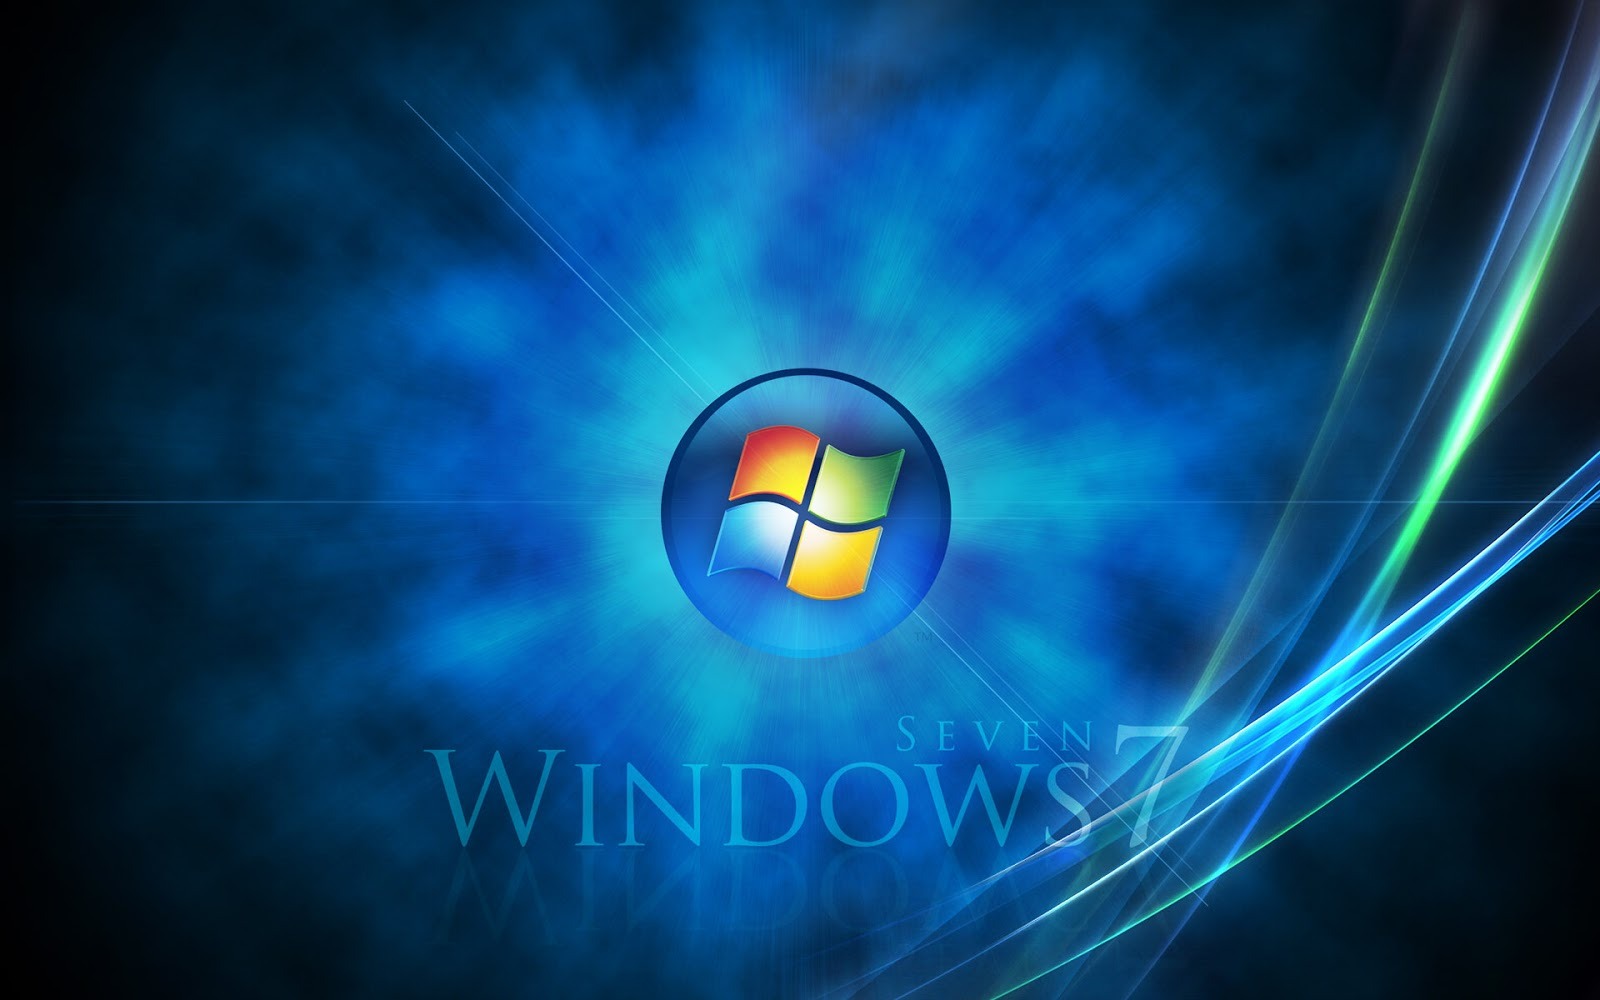 Wallpaper windows 7 full hd - Download Wallpaper win 7 | Wallpaper Full HD Wide | Wallpaperhd360